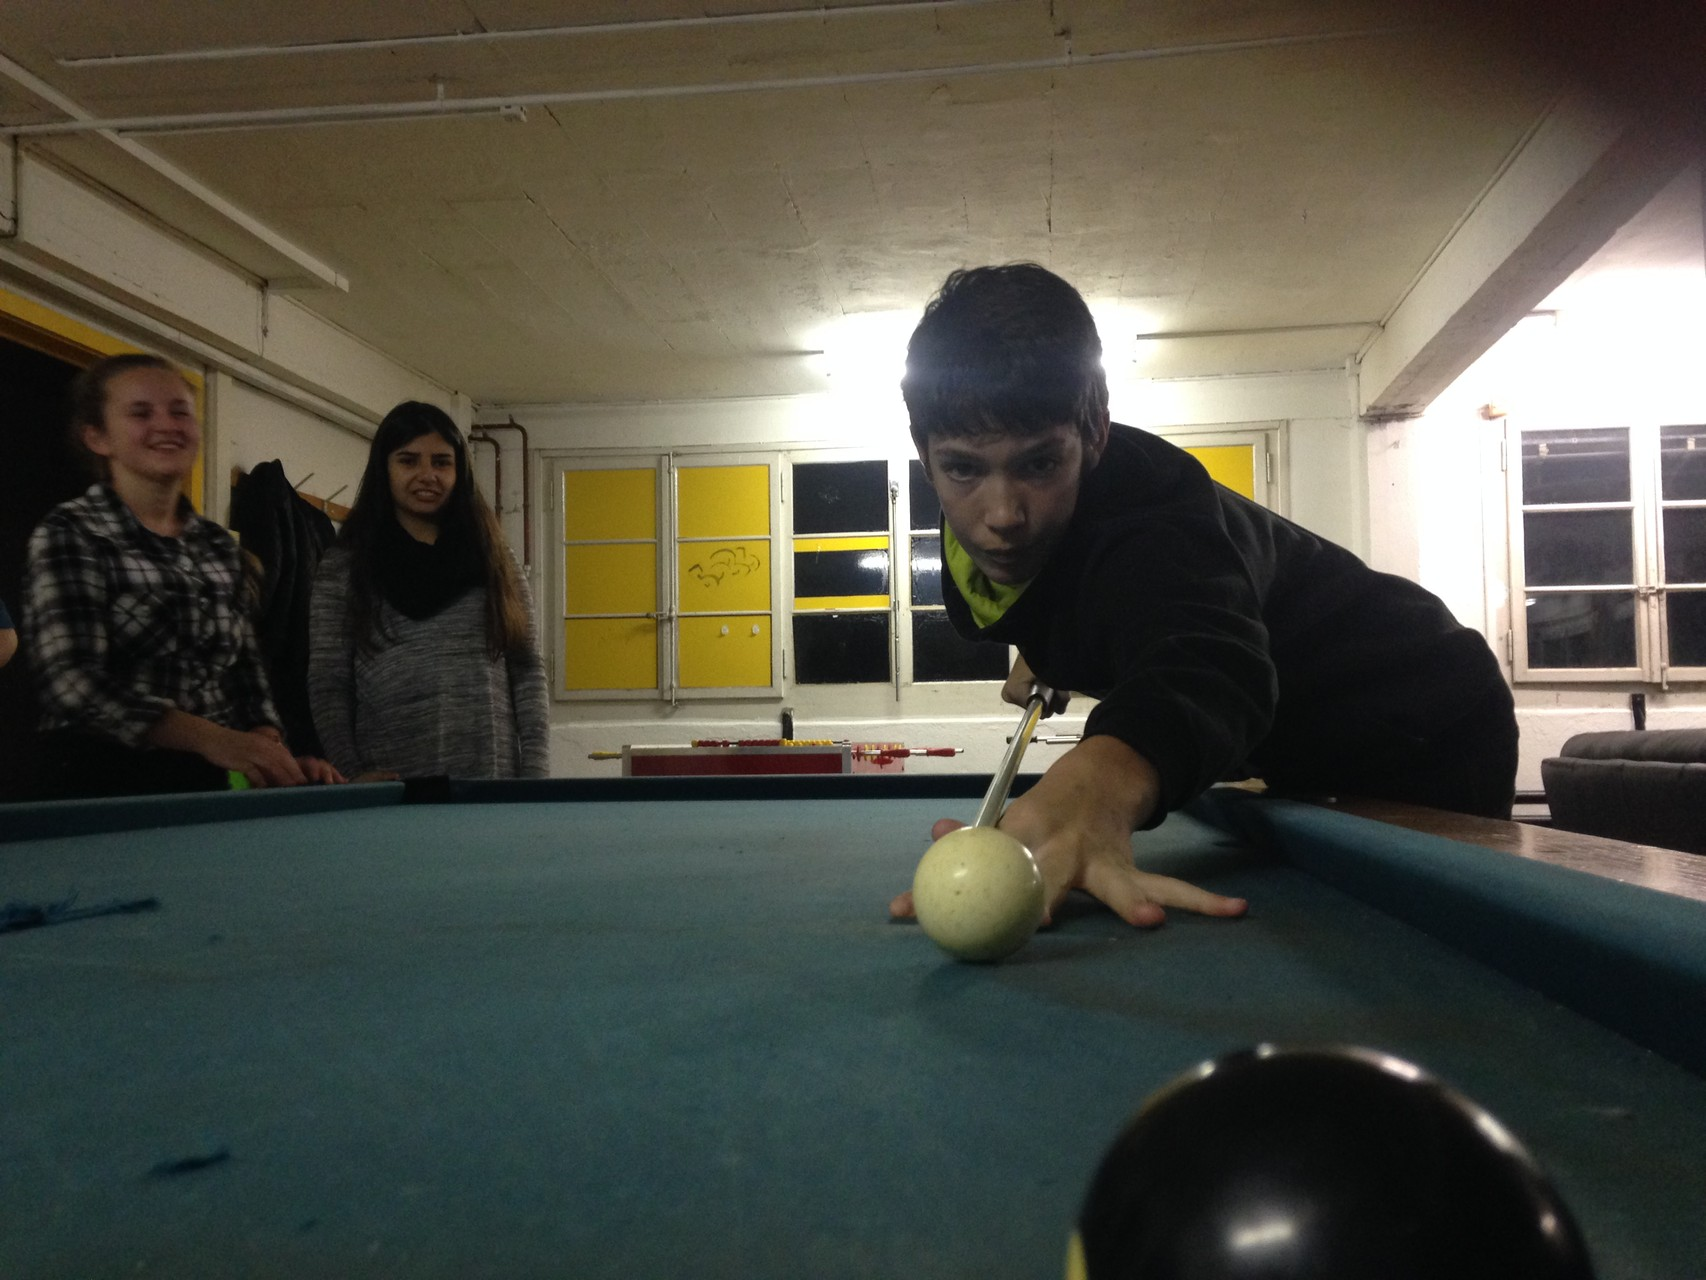 Billiardturnier